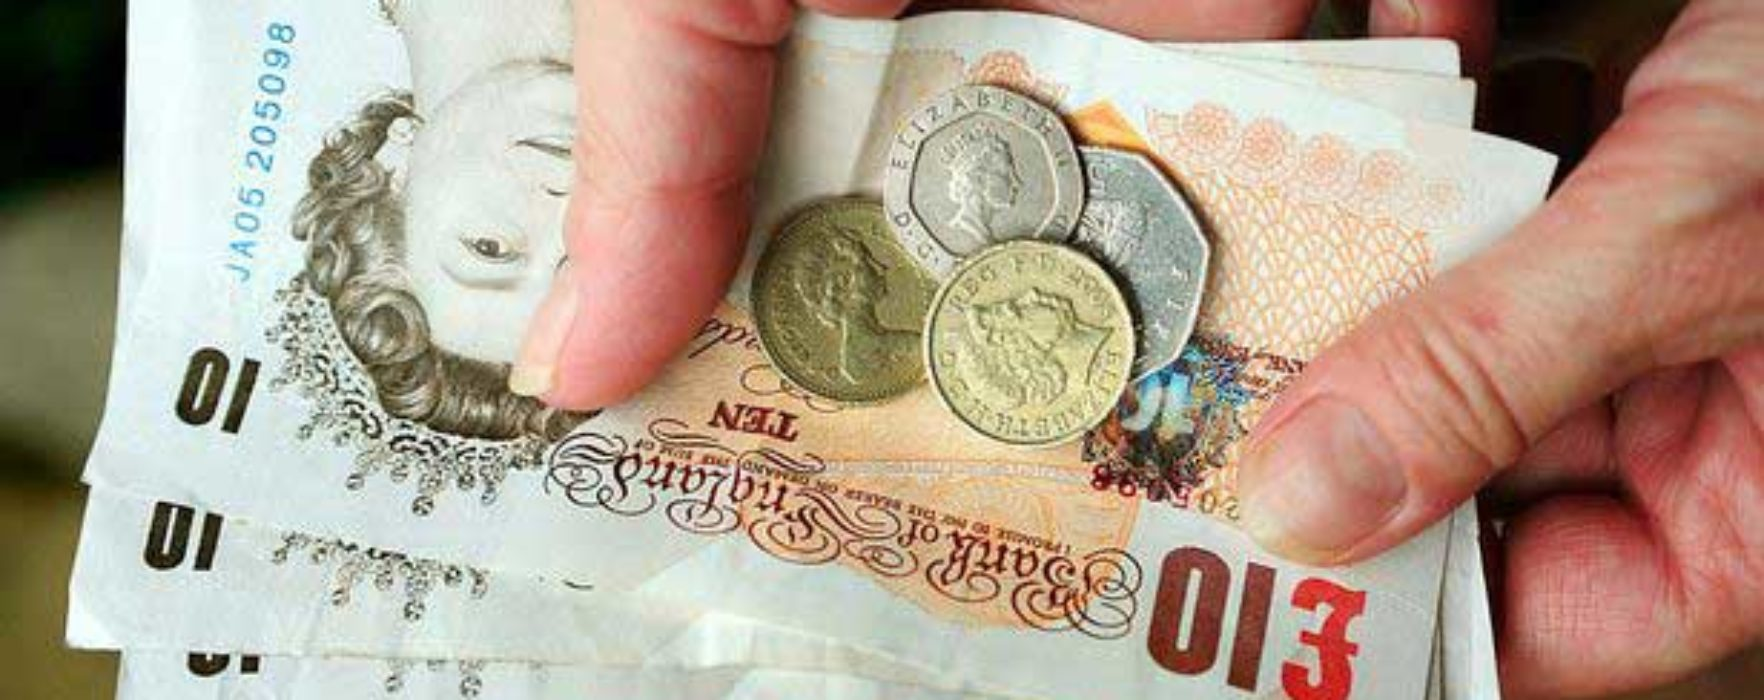 TIPS&TRICKS pentru a economisi timp si bani atunci cand esti o persoana OCUPATA